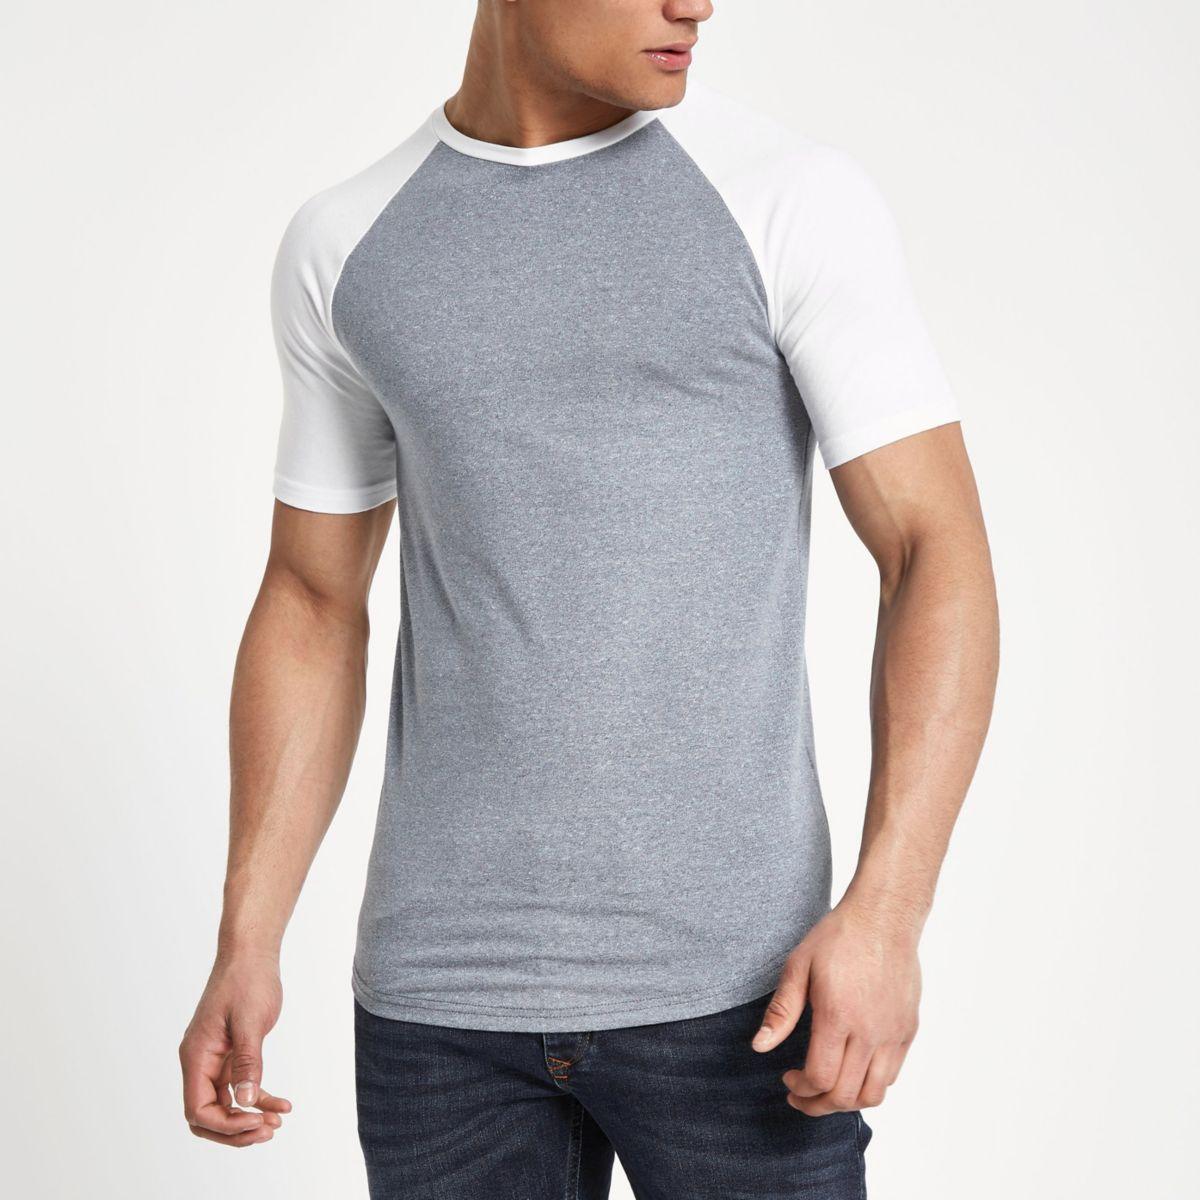 Navy Marl Muscle Fit Raglan T Shirt by River Island